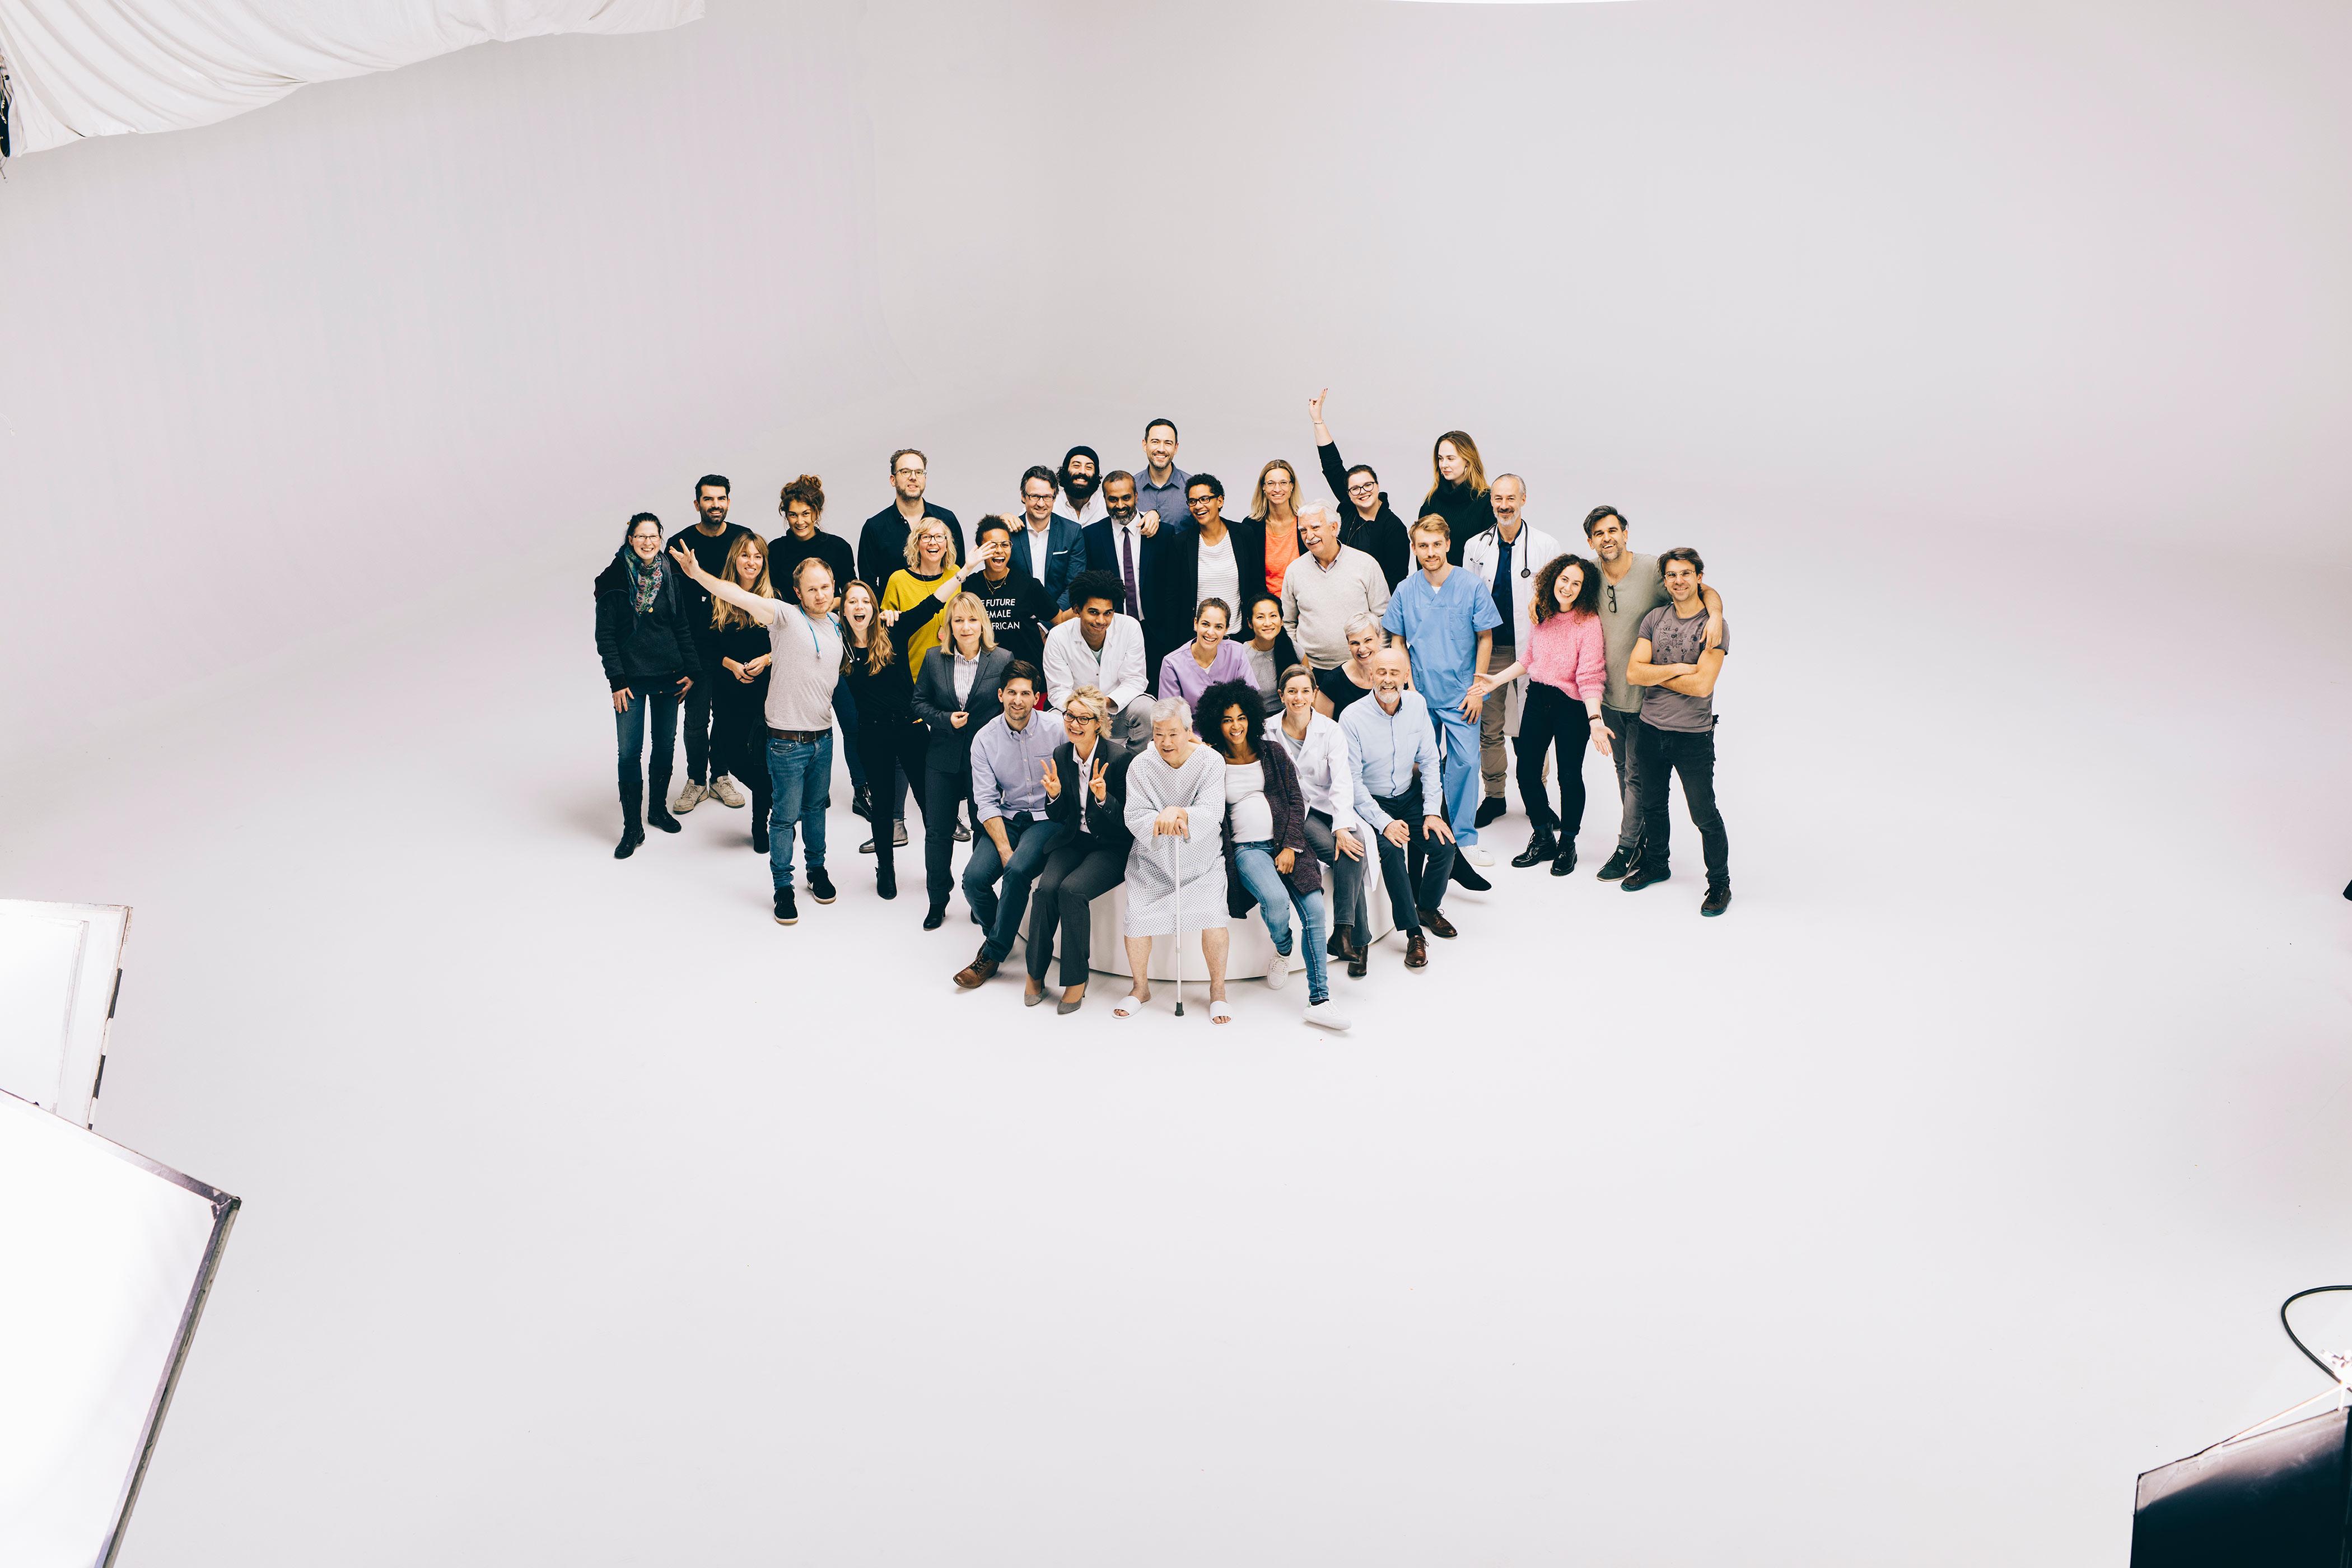 Cem Guenes 2017-11-14-W2O-GROUP-ROCHE-DIAGNOSTICS-04001